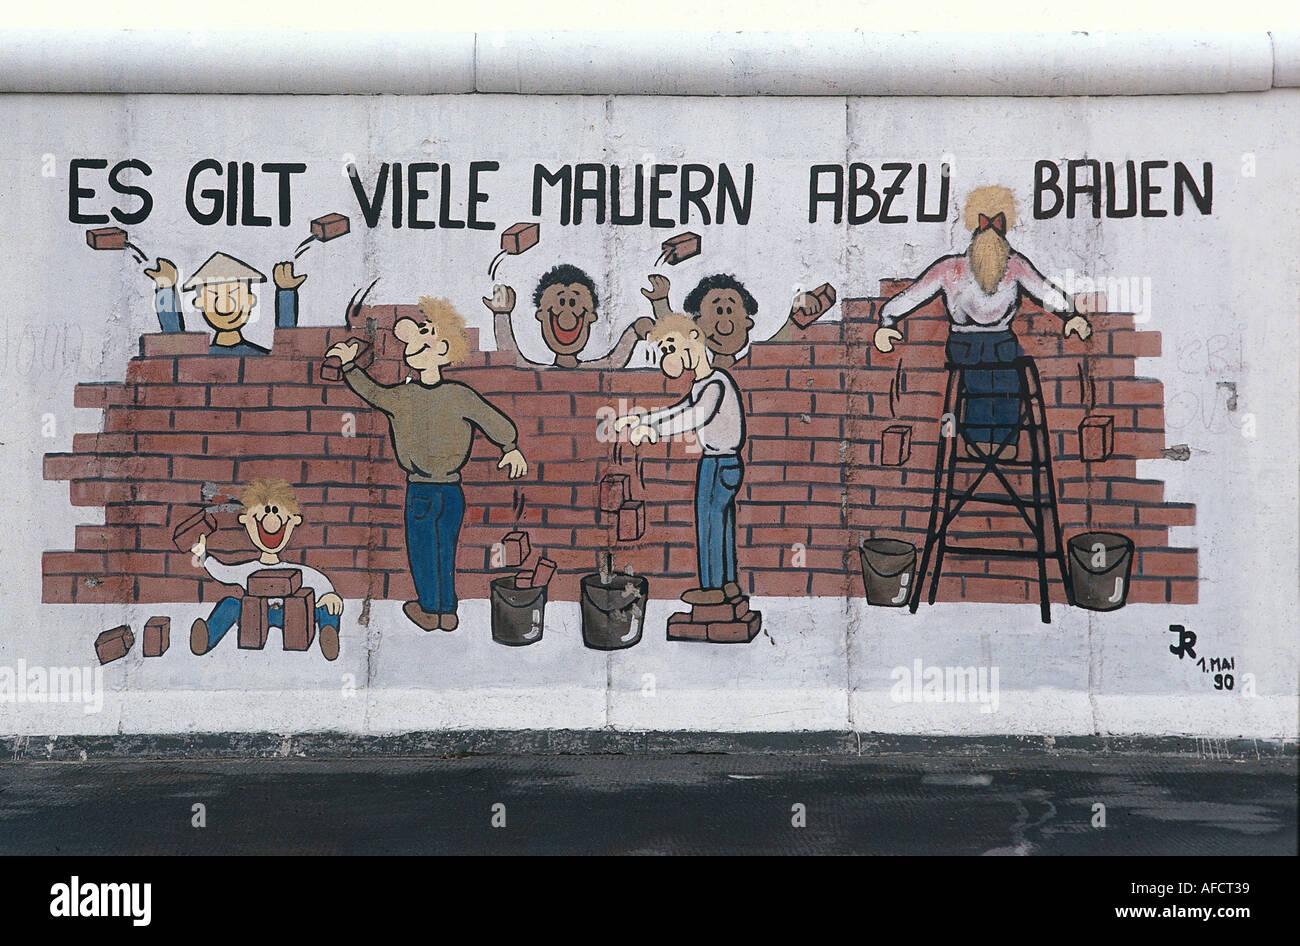 Geography Travel Germany Berlin Wall Art East Side Gallery